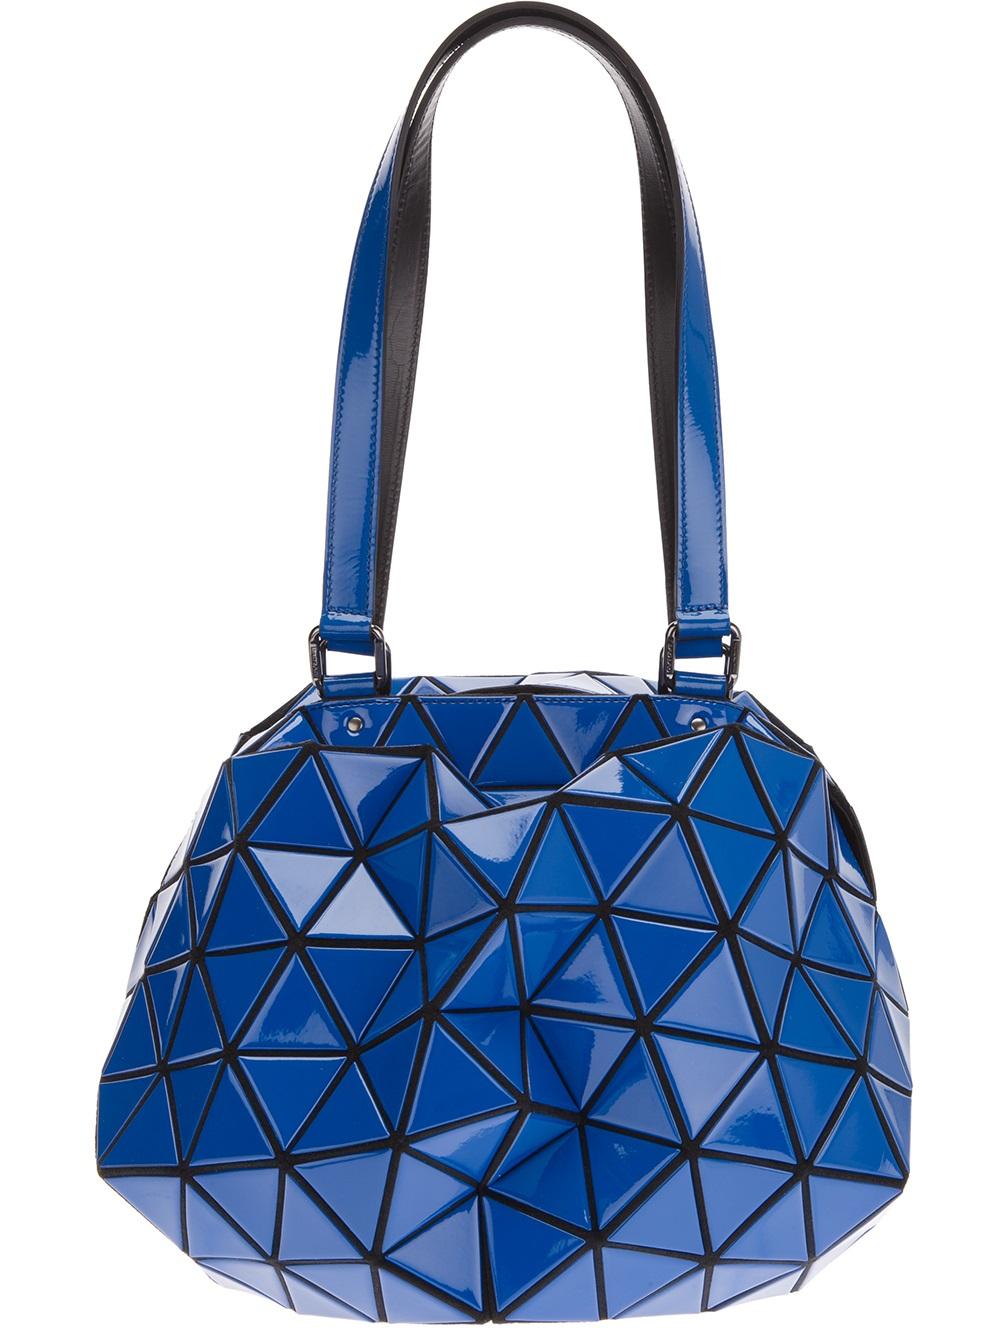 Bao Bao Issey Miyake Geometric Panel Shoulder Bag In Blue